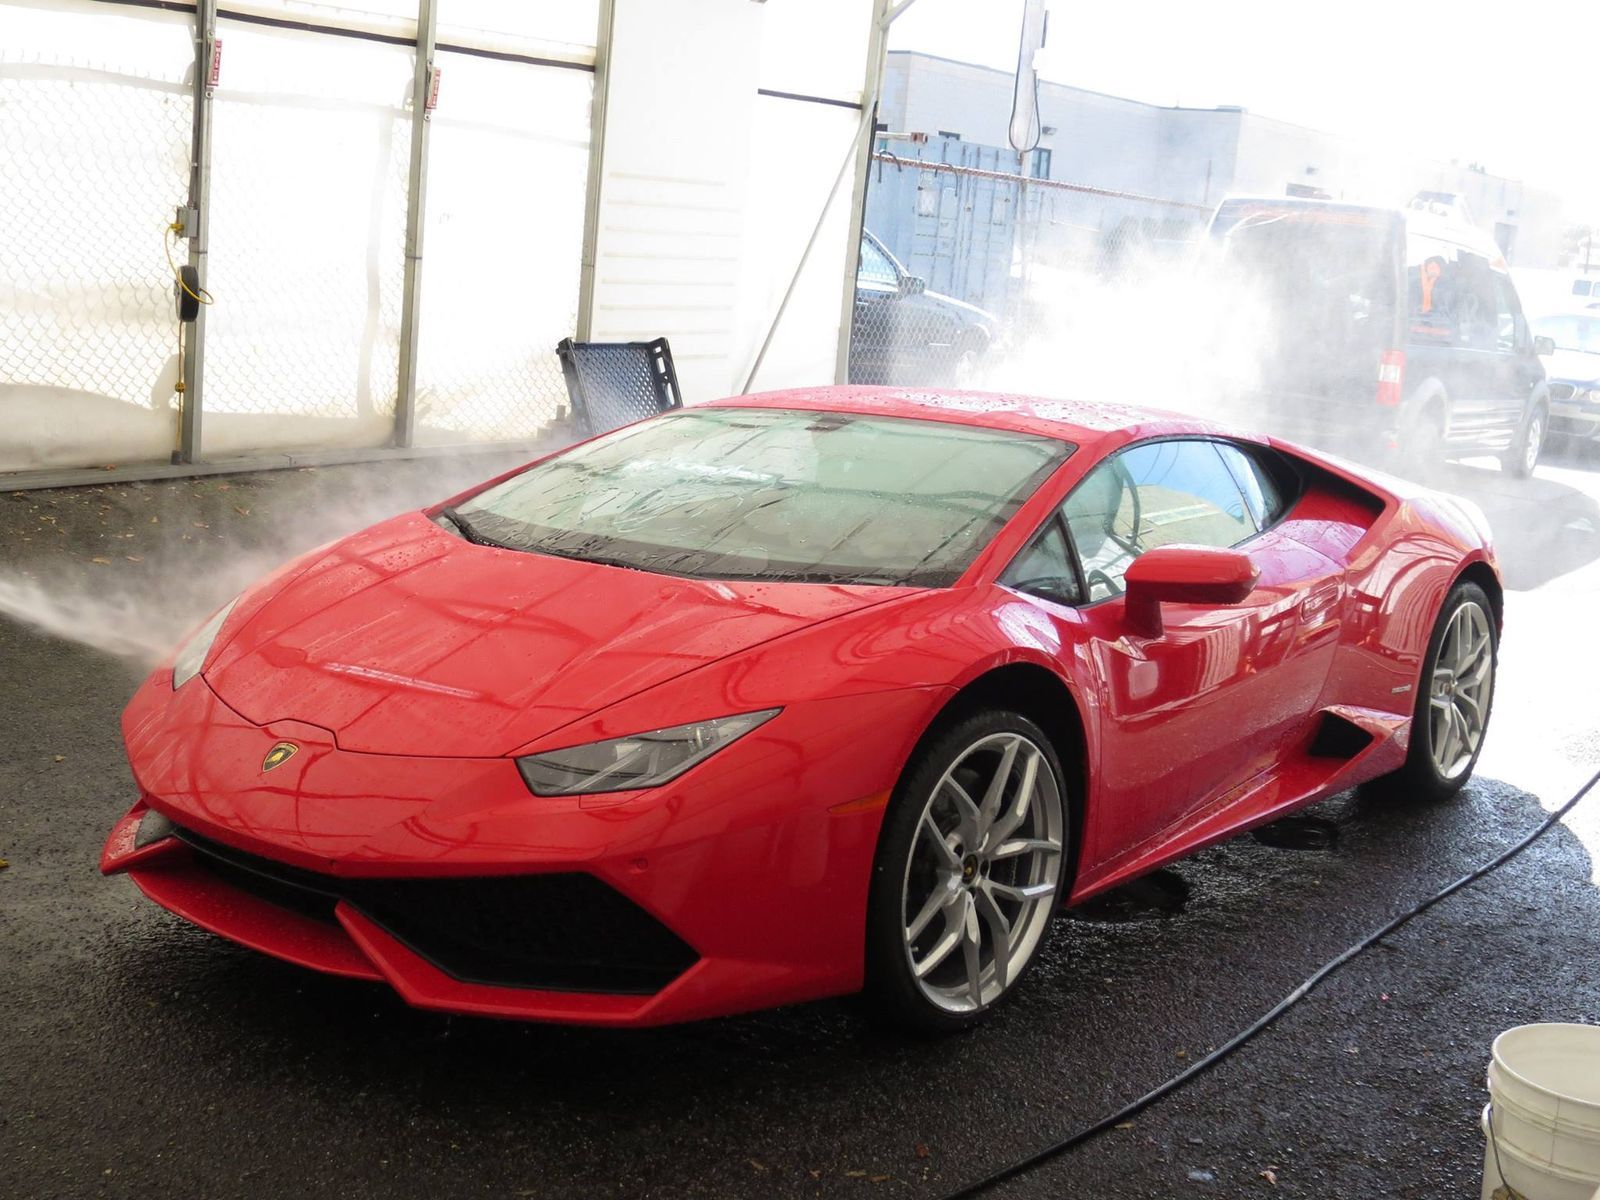 Lamborghini Huracan | Lamborghini Huracan with XPEL ULTIMATE self-healing clear bra